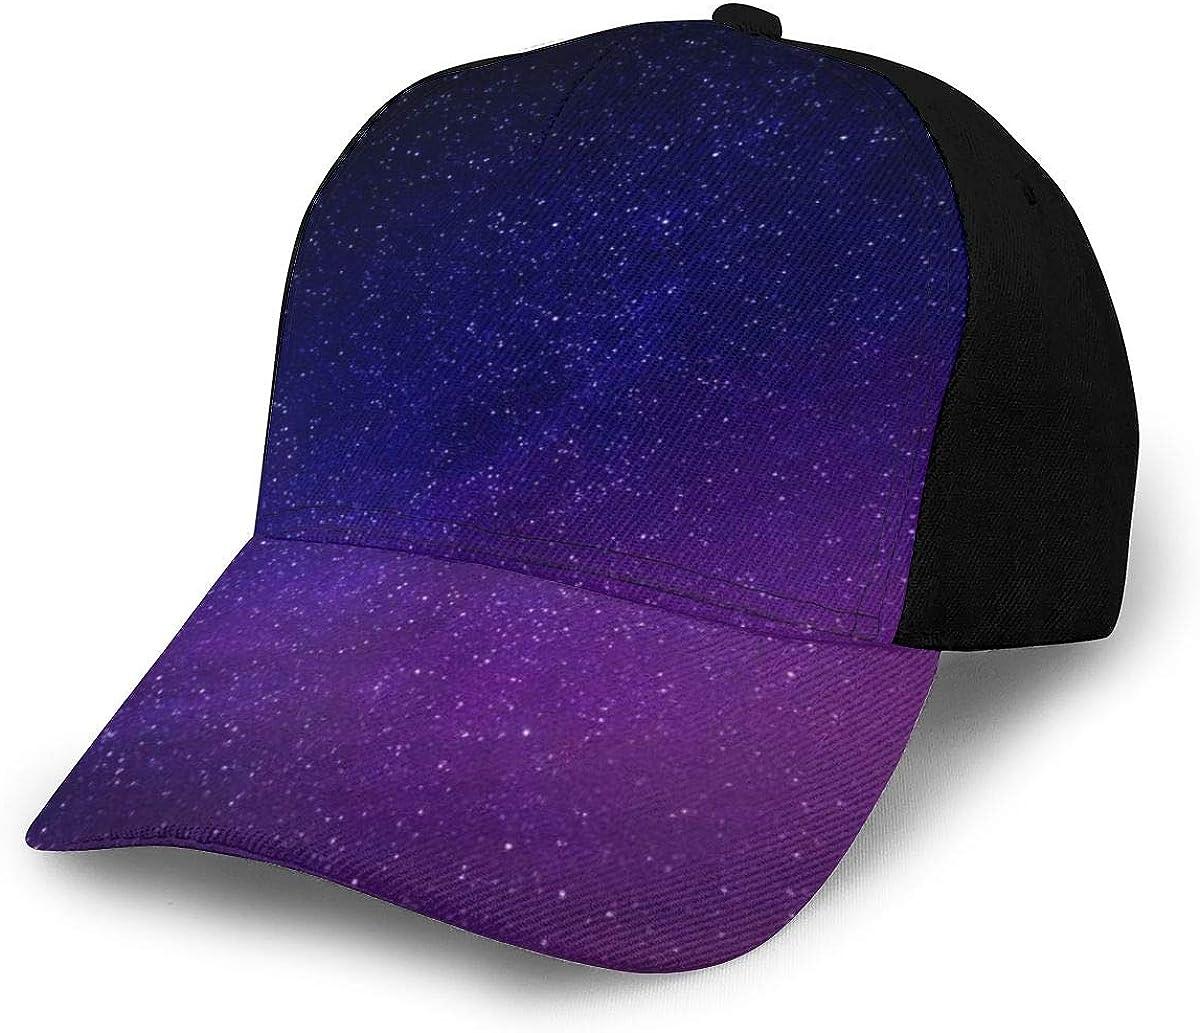 Nebula Starry Sky Galaxy Glitter Classic Baseball Cap Men Women Dad Hat Twill Adjustable Size Black